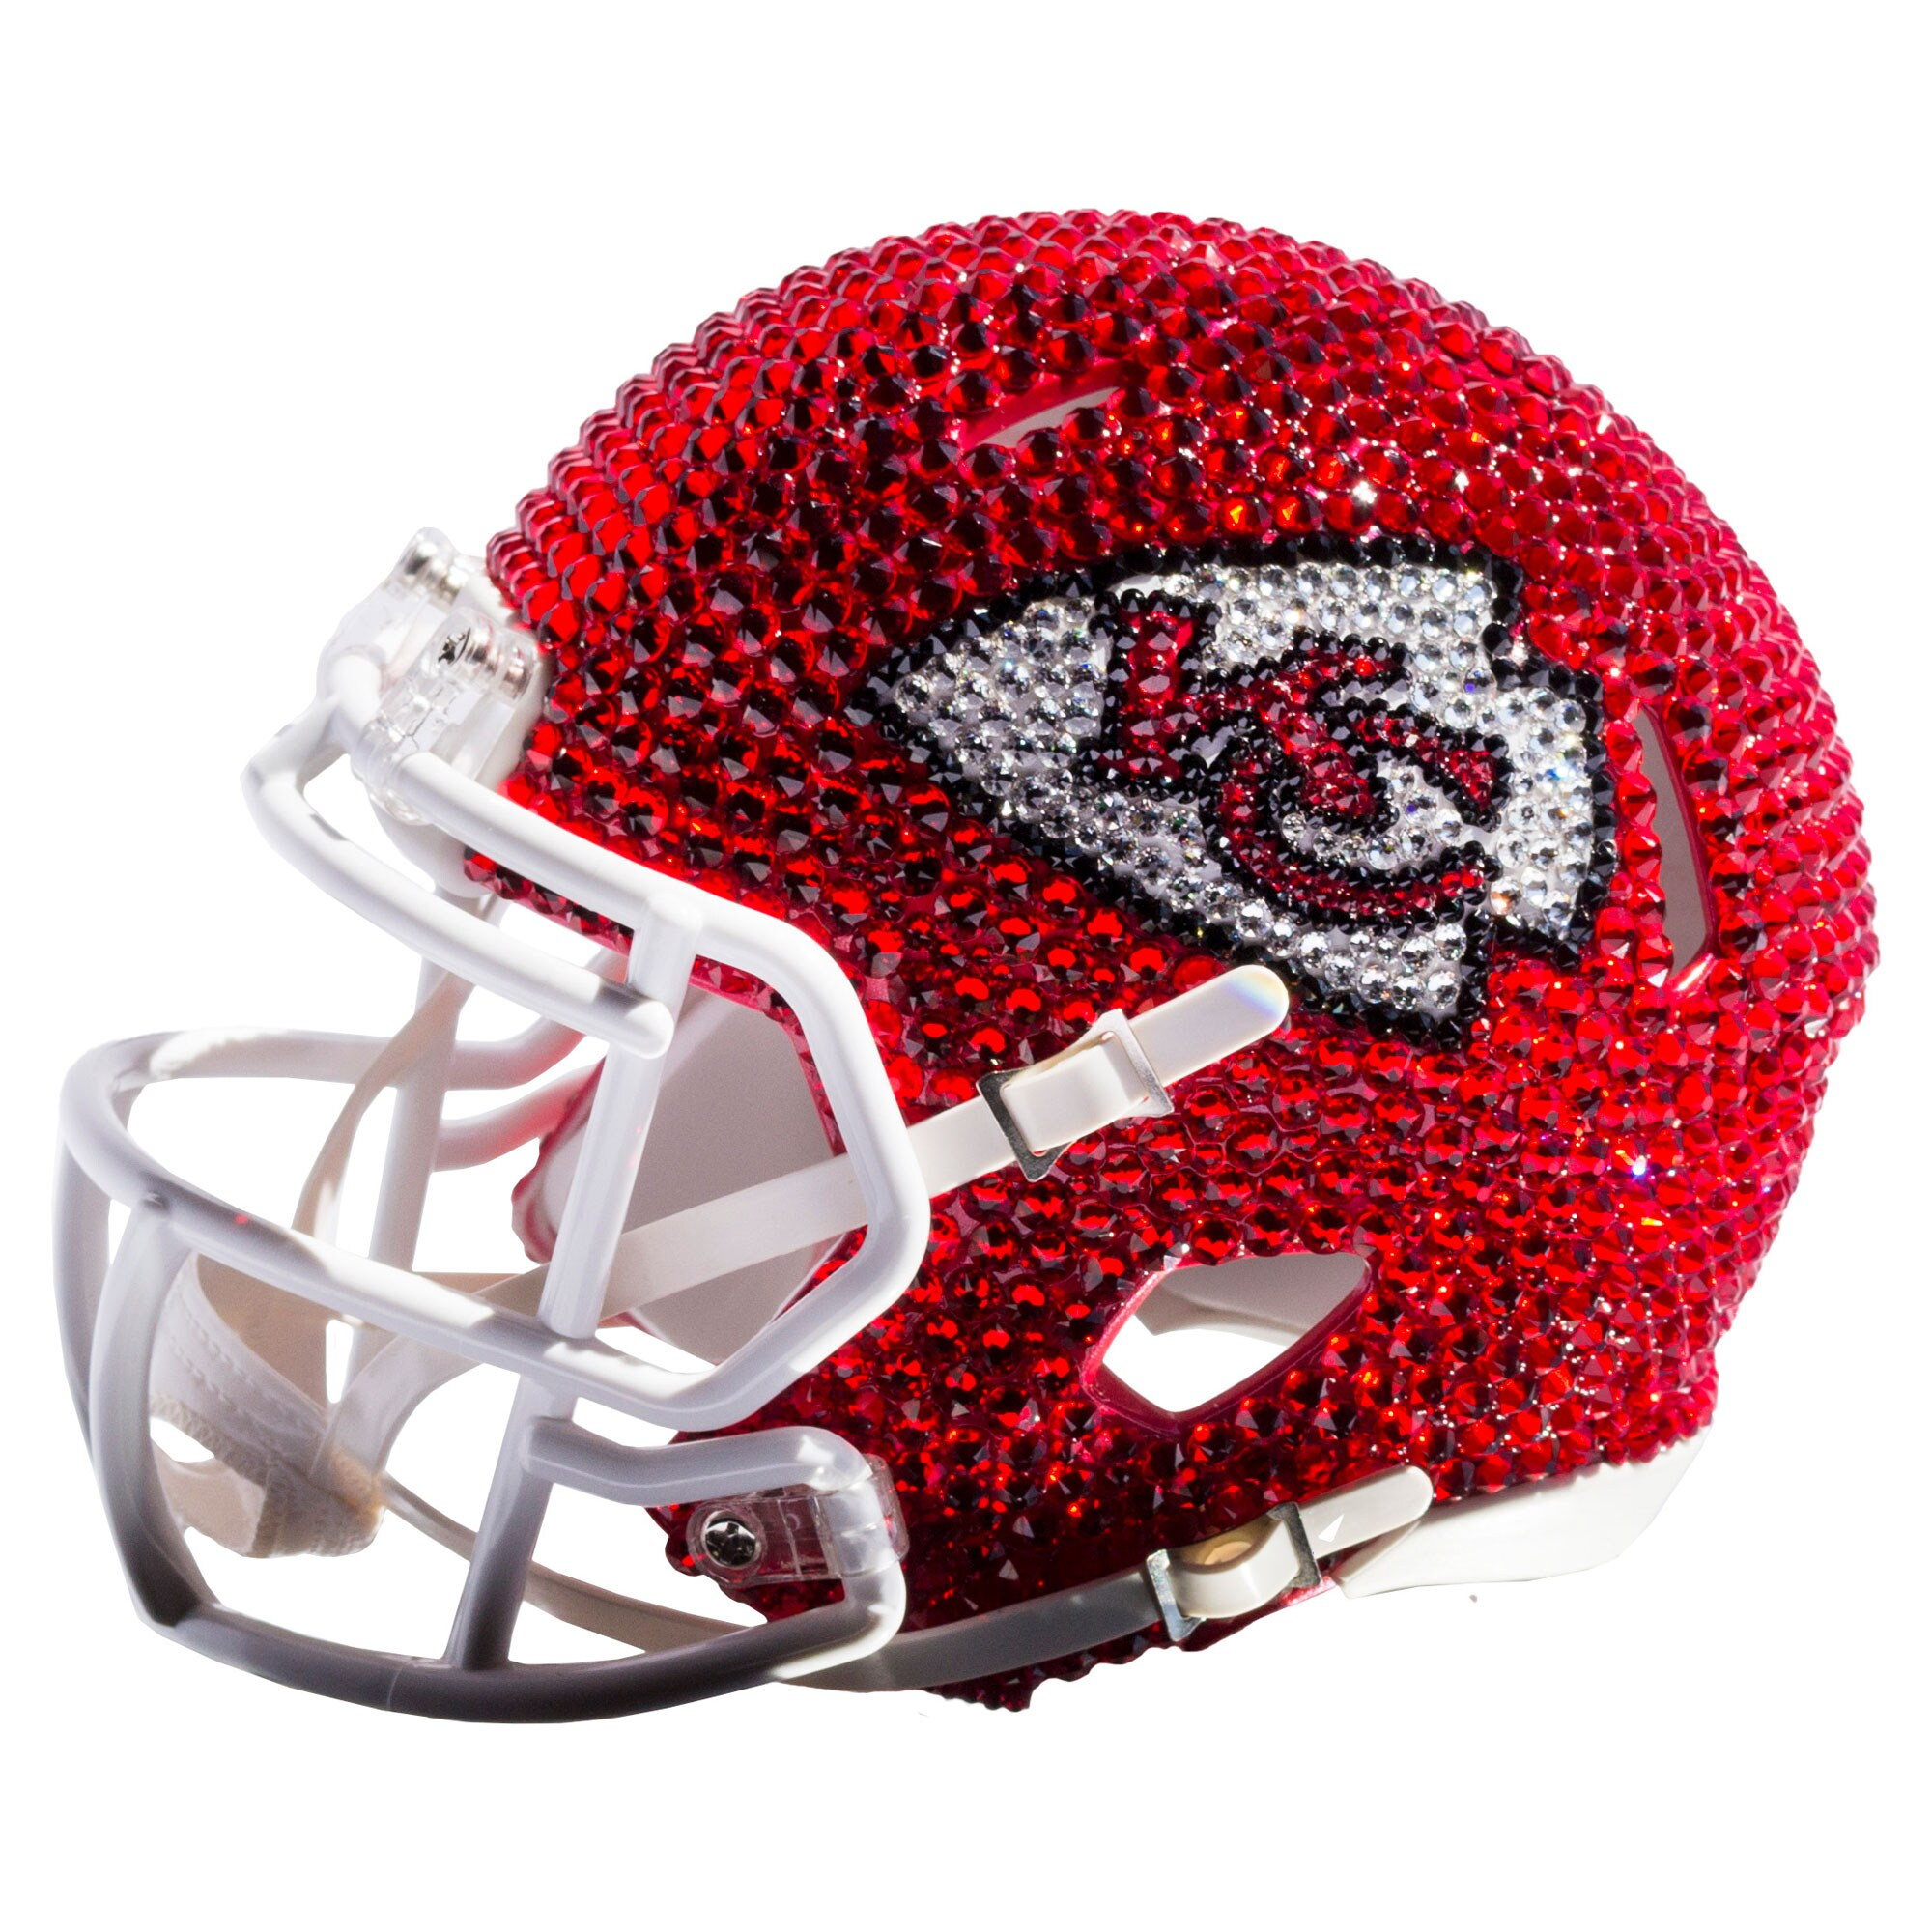 Kansas City Chiefs Swarovski Crystal Mini Football Helmet